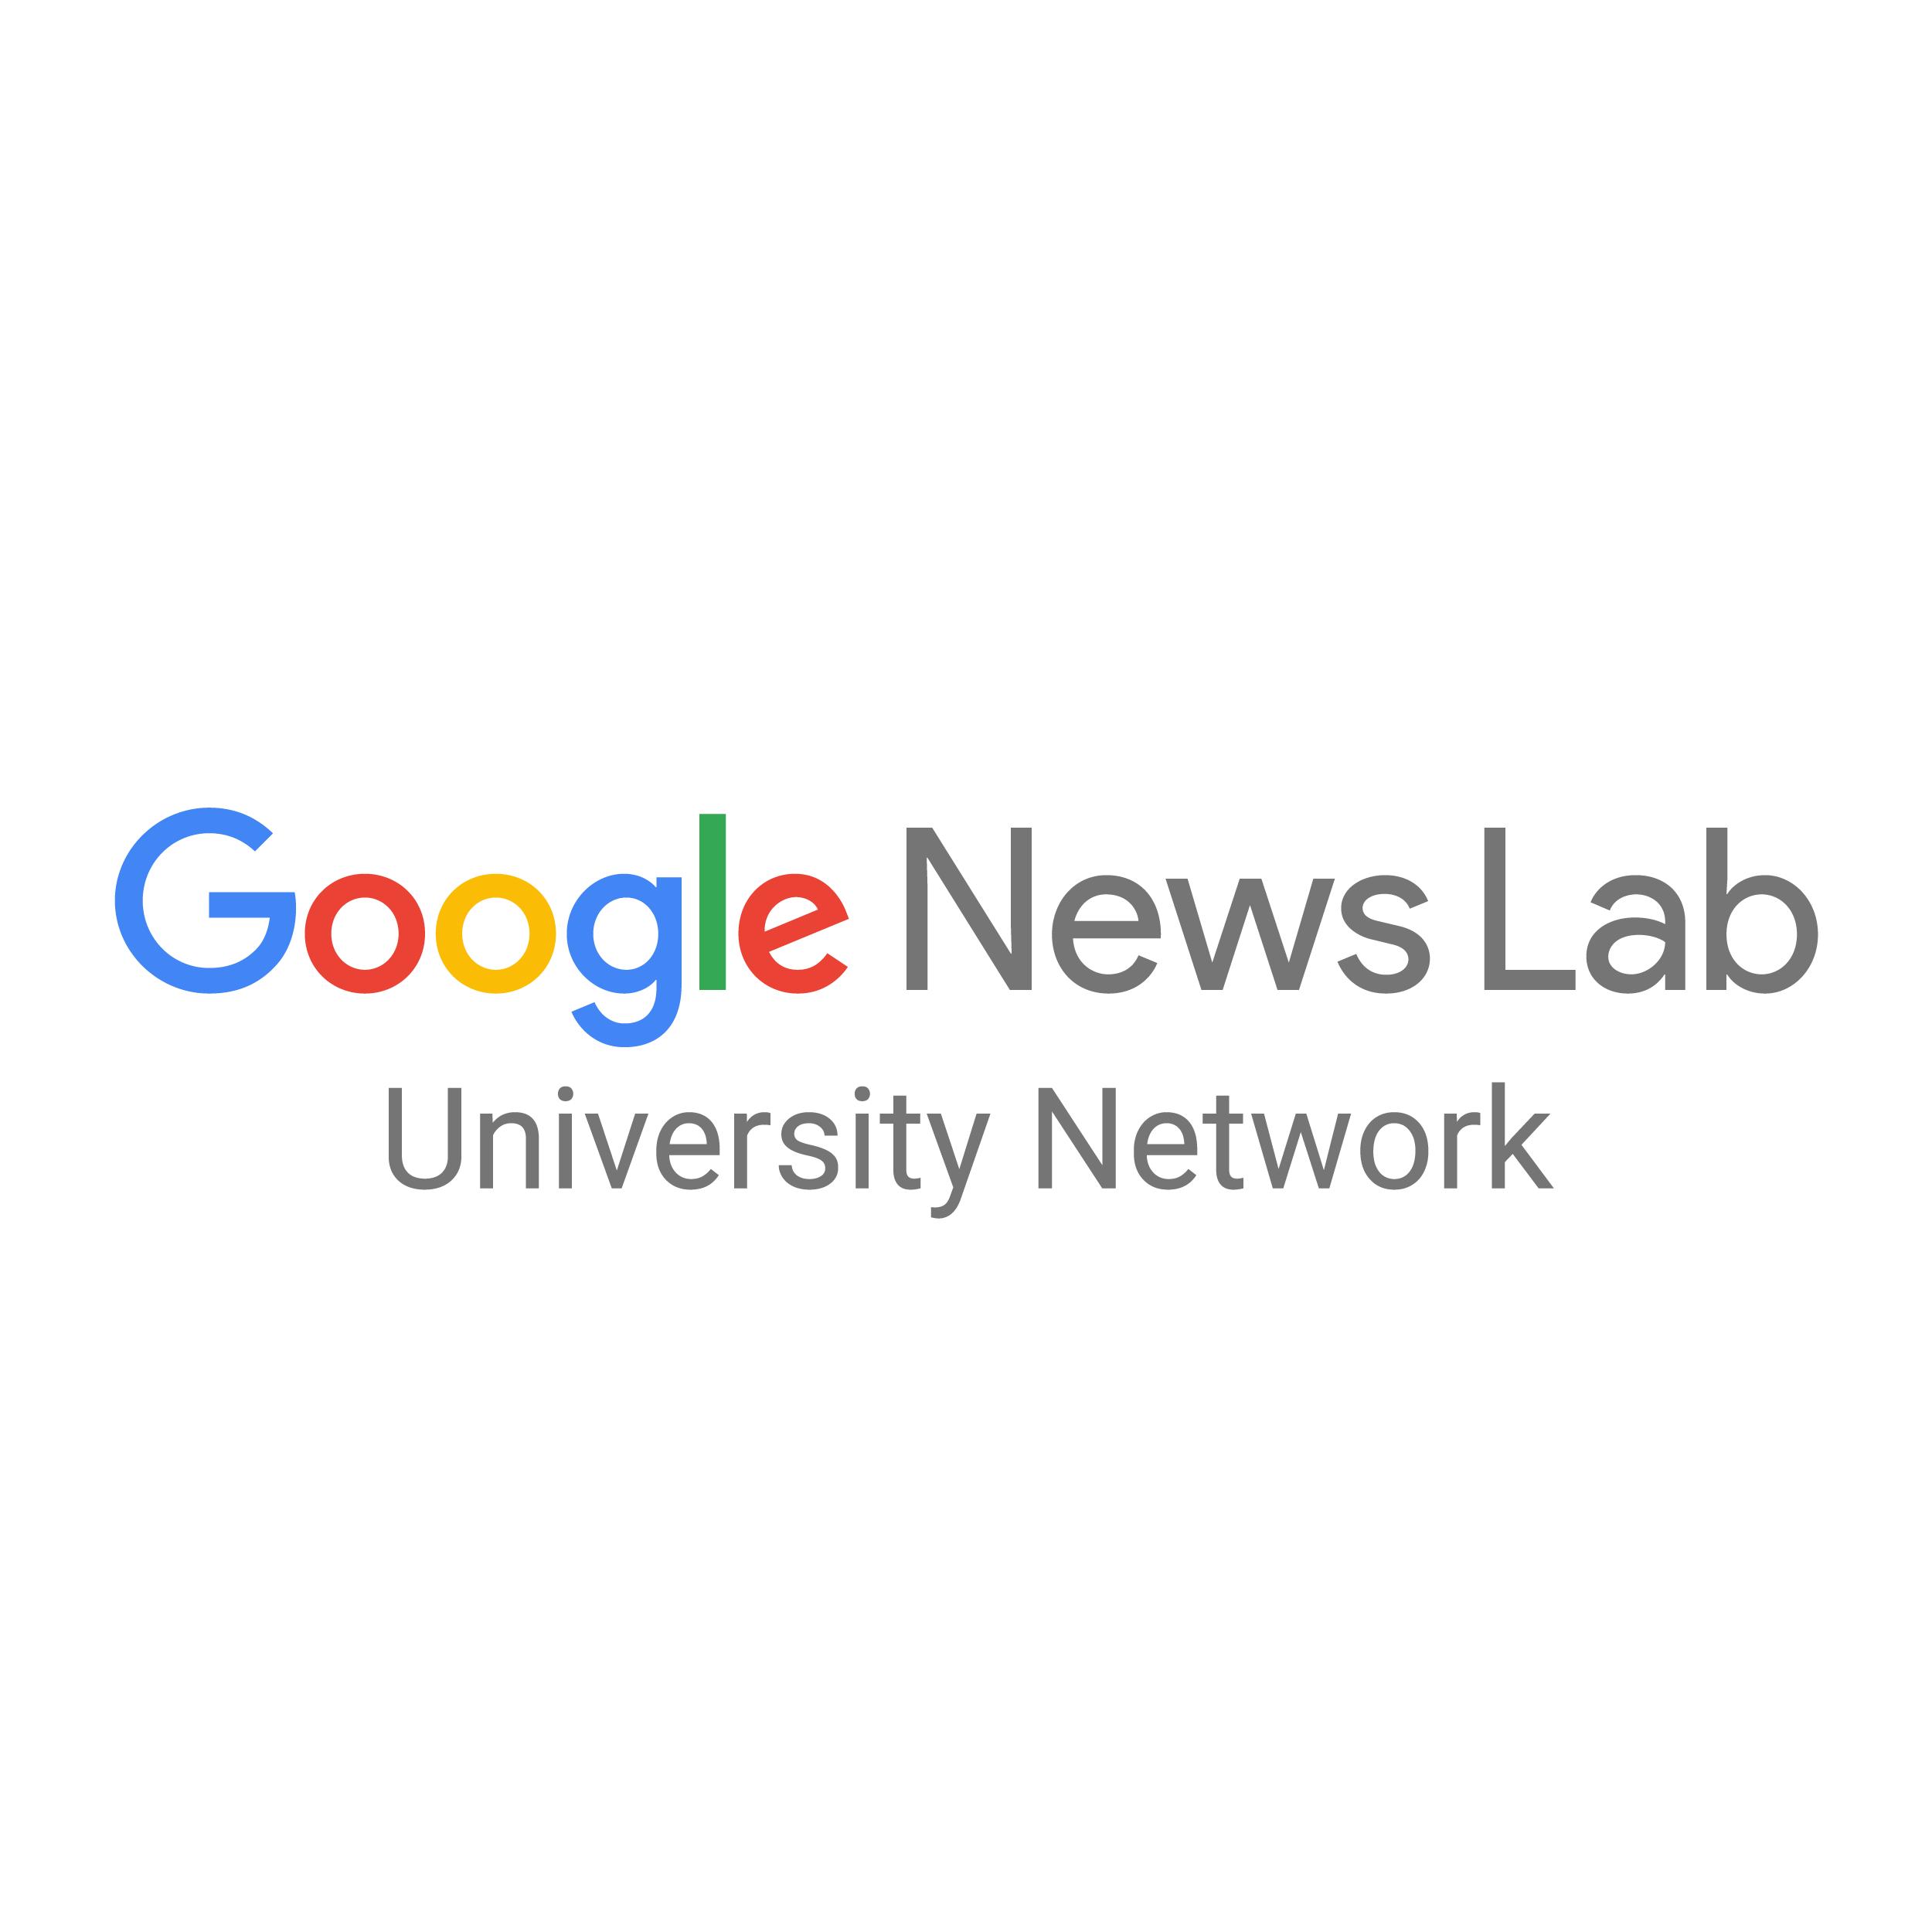 Google News Lab University Network logo